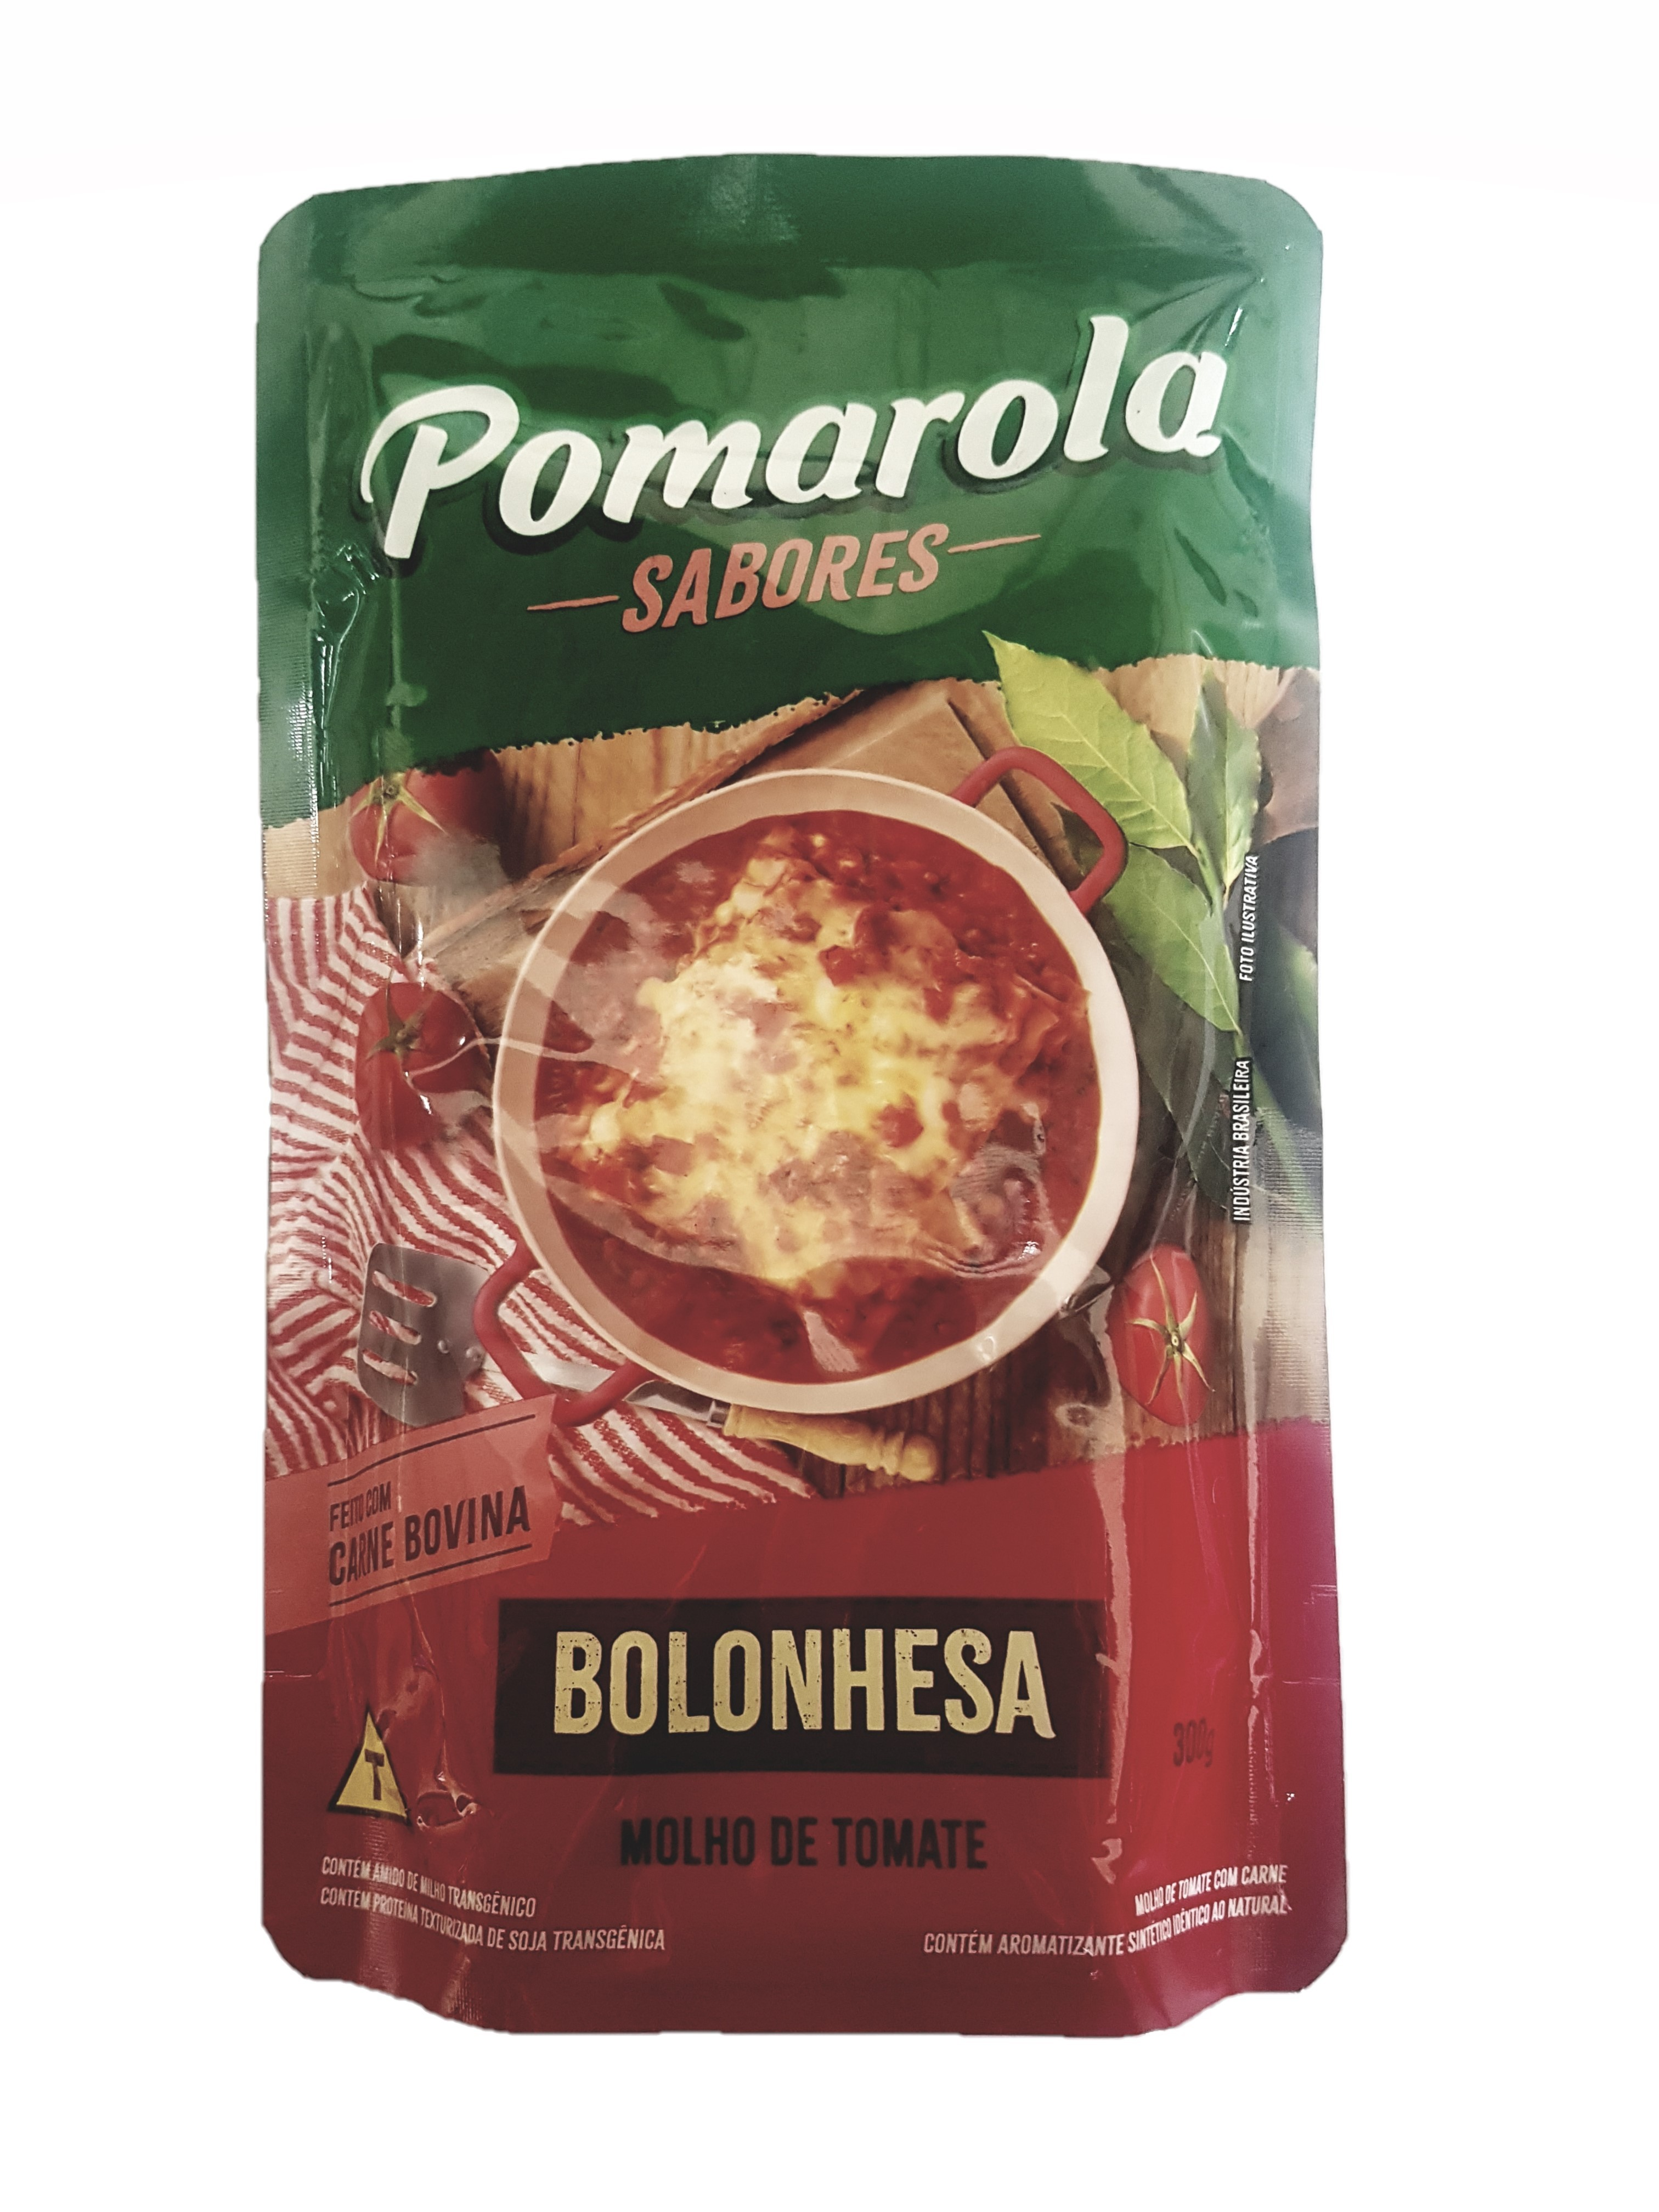 MOLHO DE TOMATE À BOLONHESA POMAROLA SACHÊ 300G